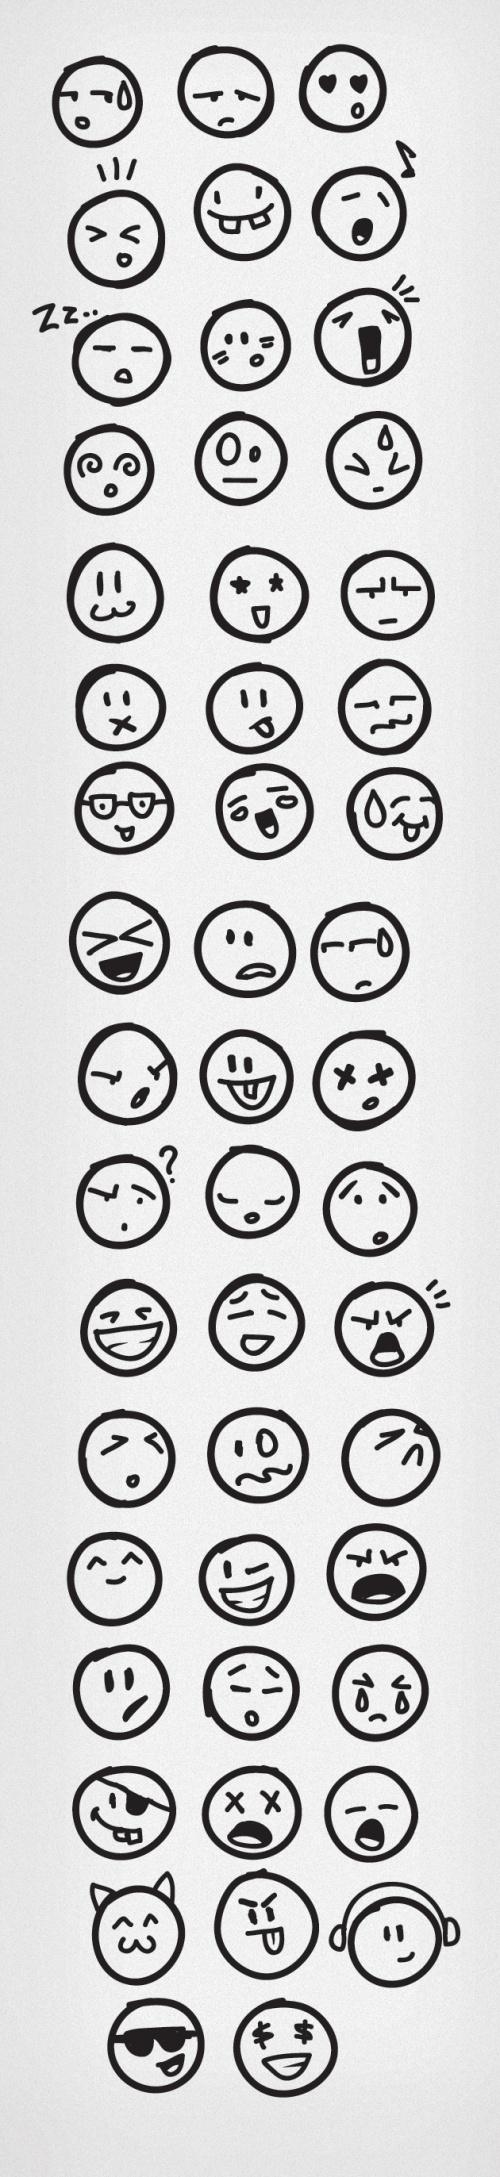 Designtnt - Vector Doodle Emoticons